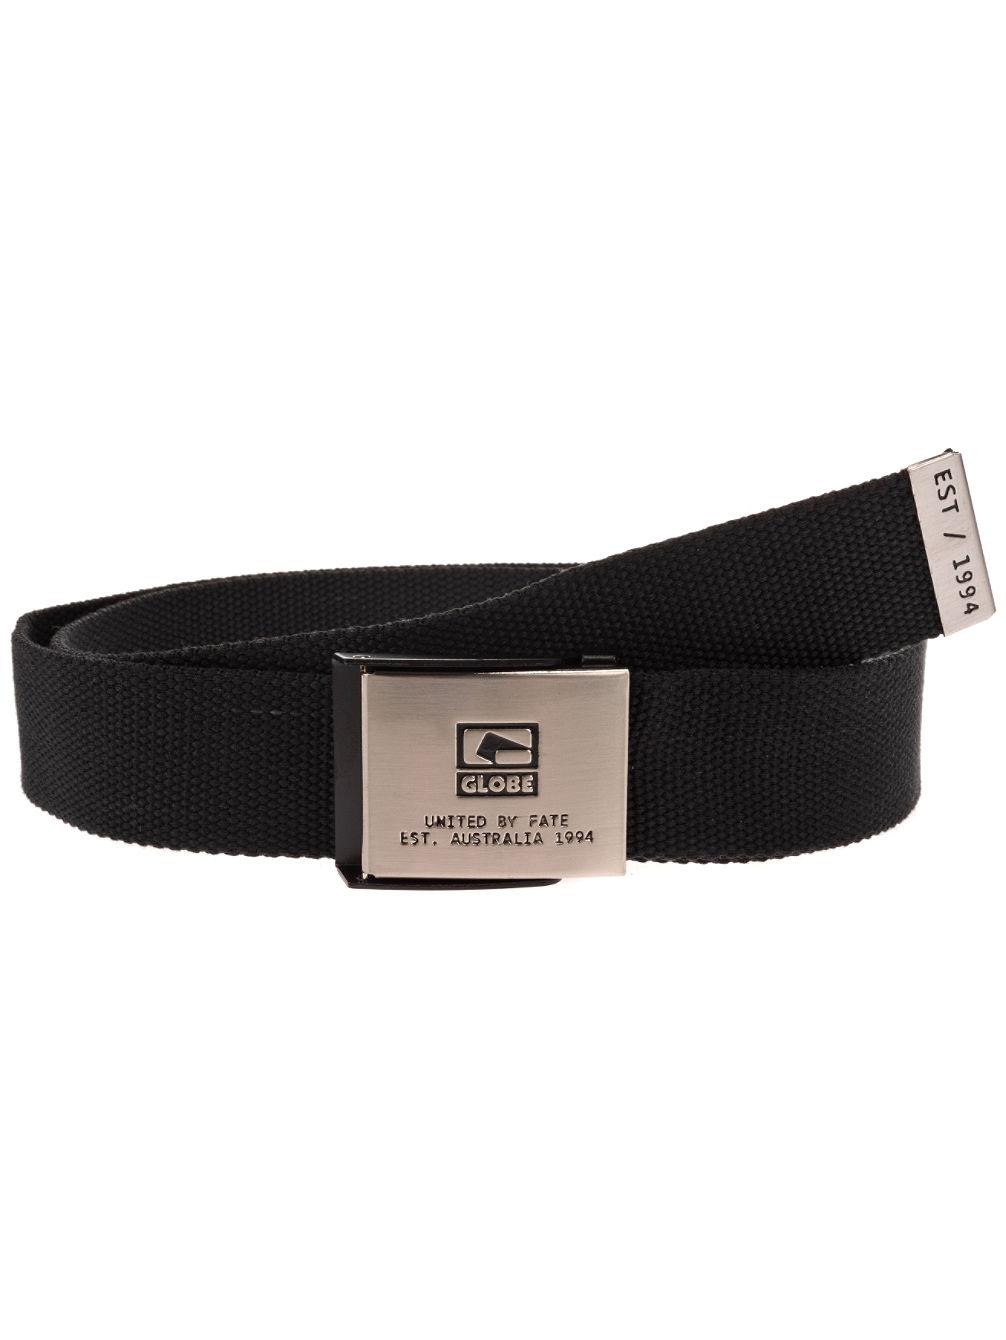 globe-redman-belt